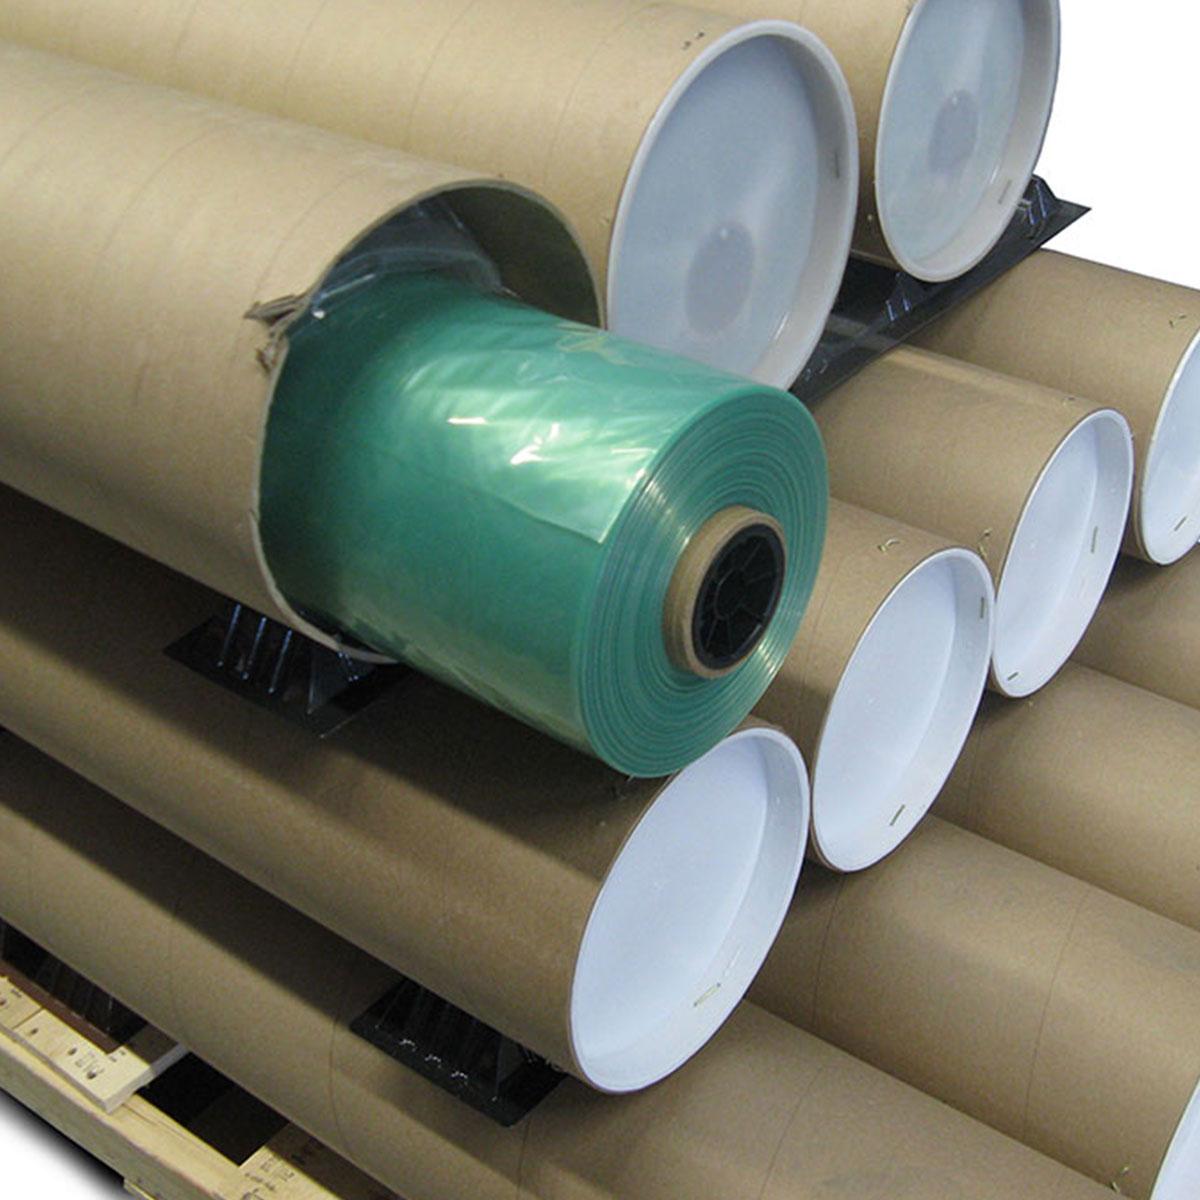 vacuum bag nylon 1200 green lft 0076mm x 1200mm 528m 0003 x 48